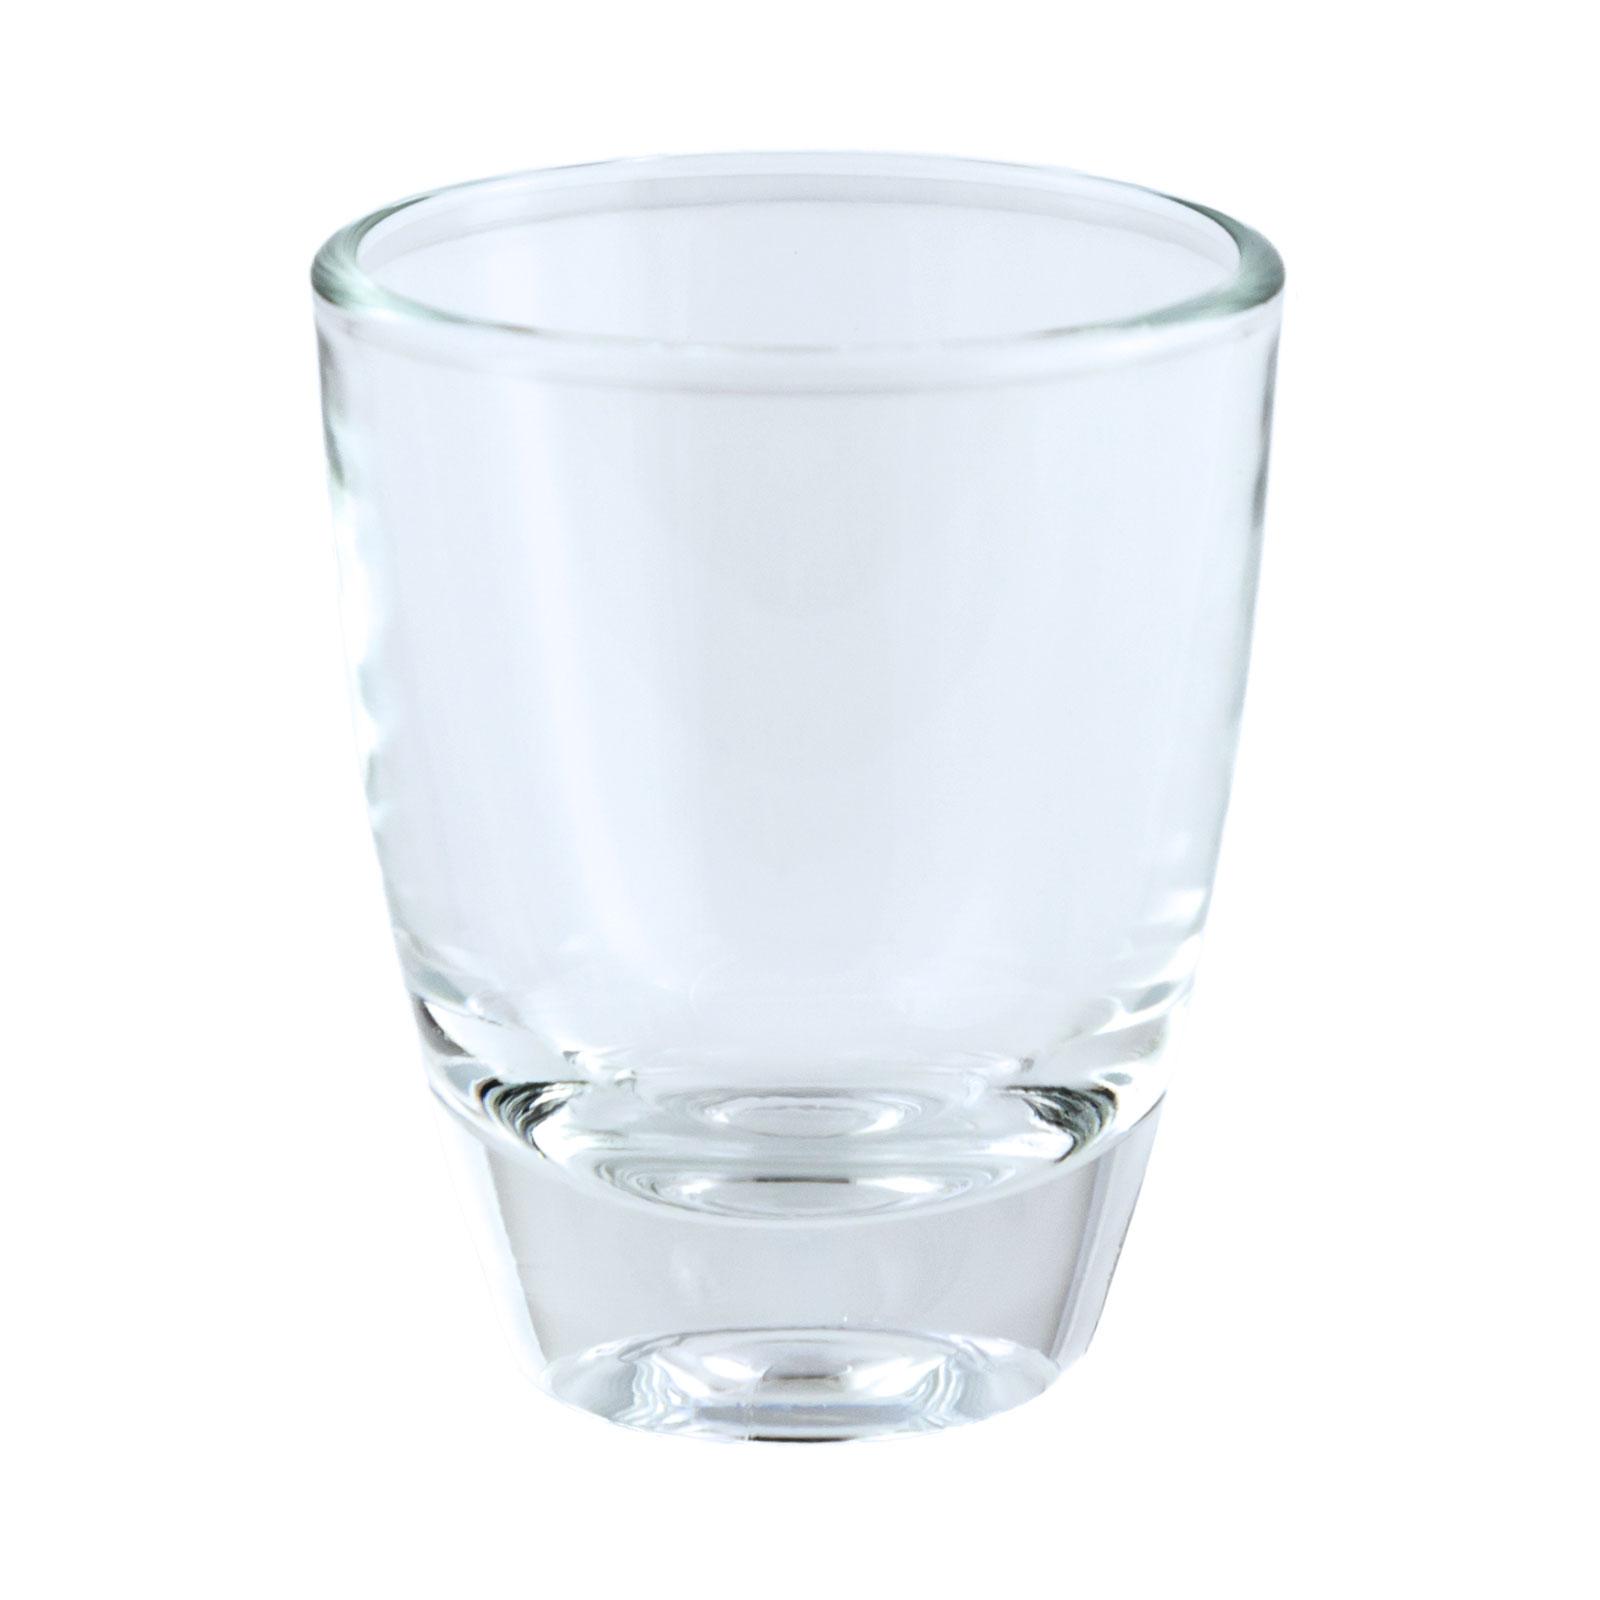 2cl Schnapsglas